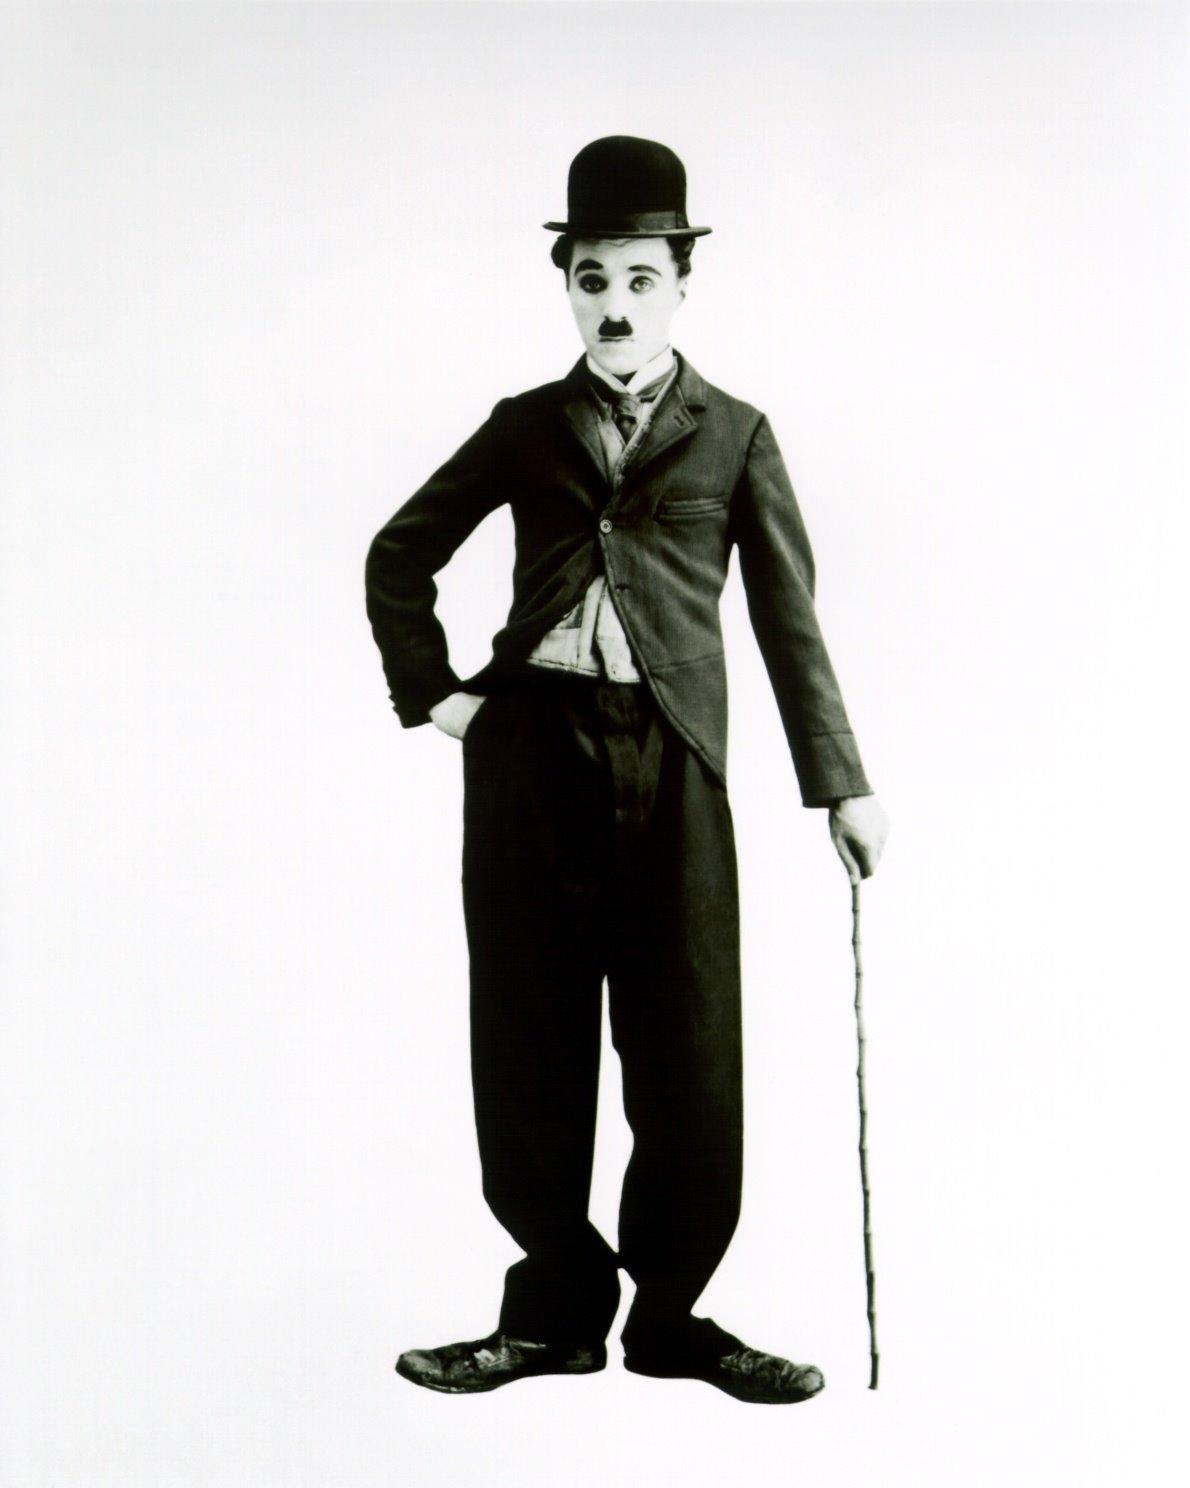 Atemberaubend Resumo Tempos Modernos Chaplin Bilder - Entry Level ...